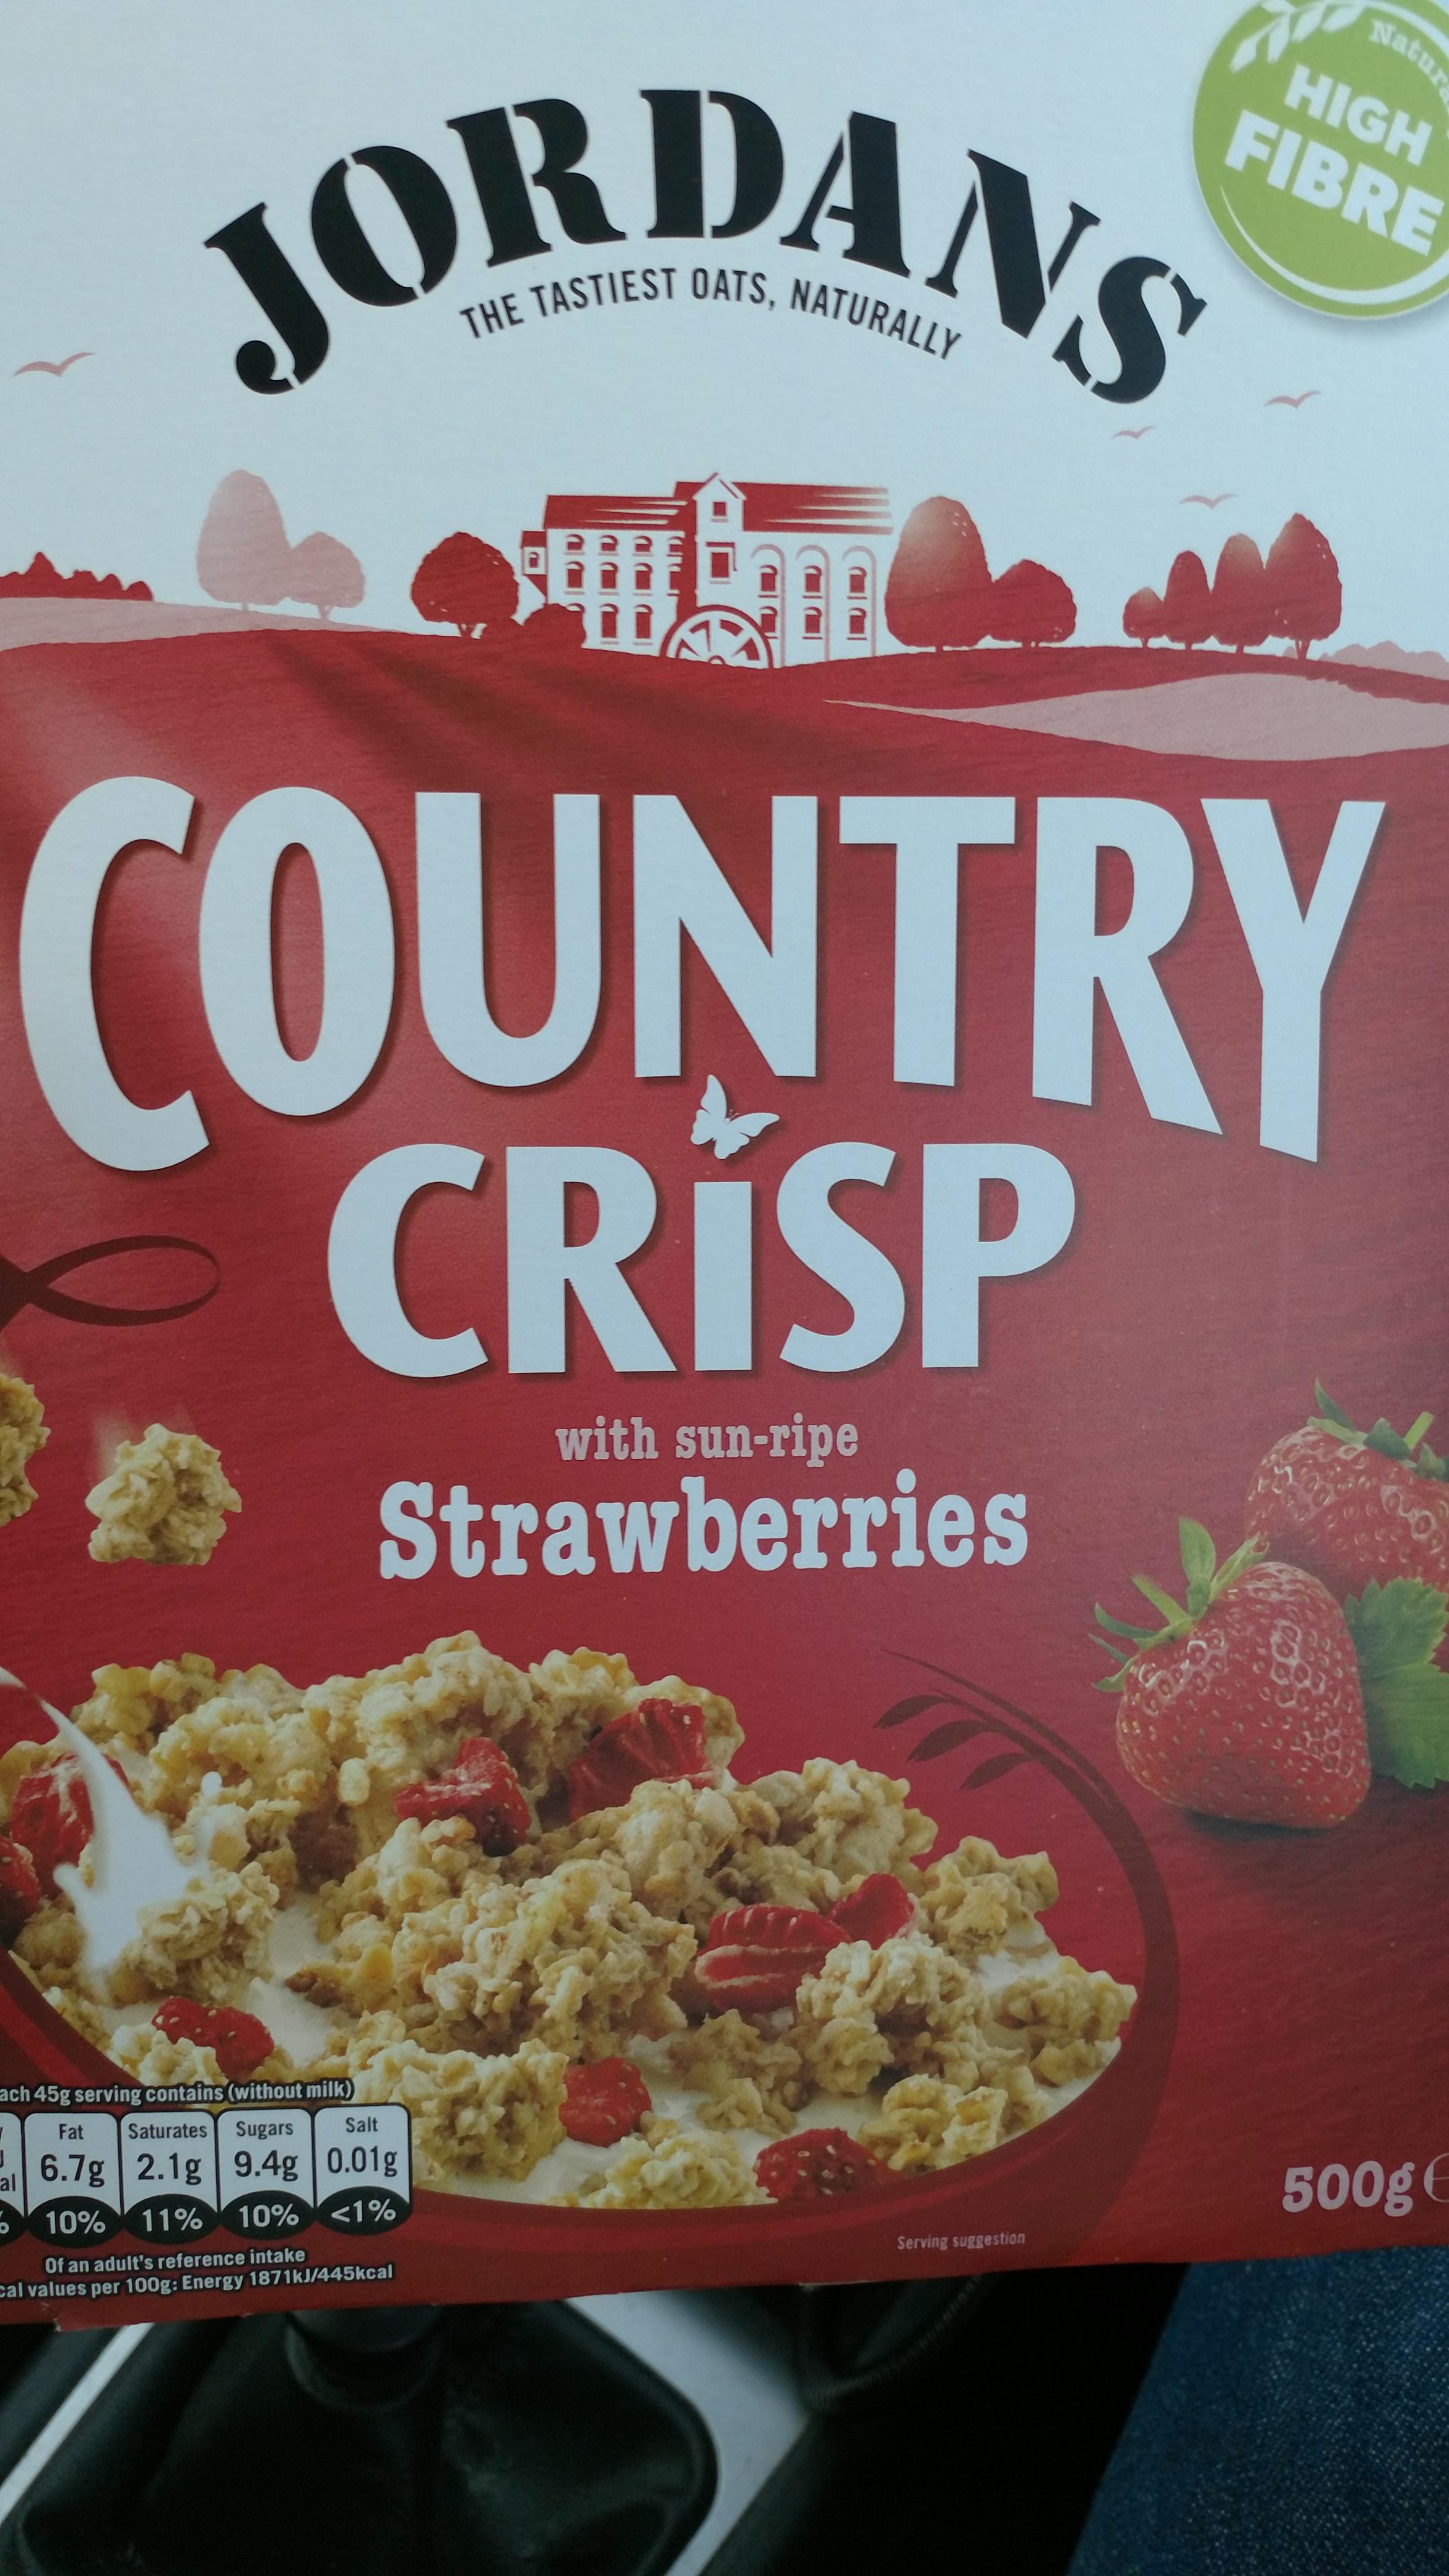 Jordans country crisp all flavour  £1.50 at Morrisons